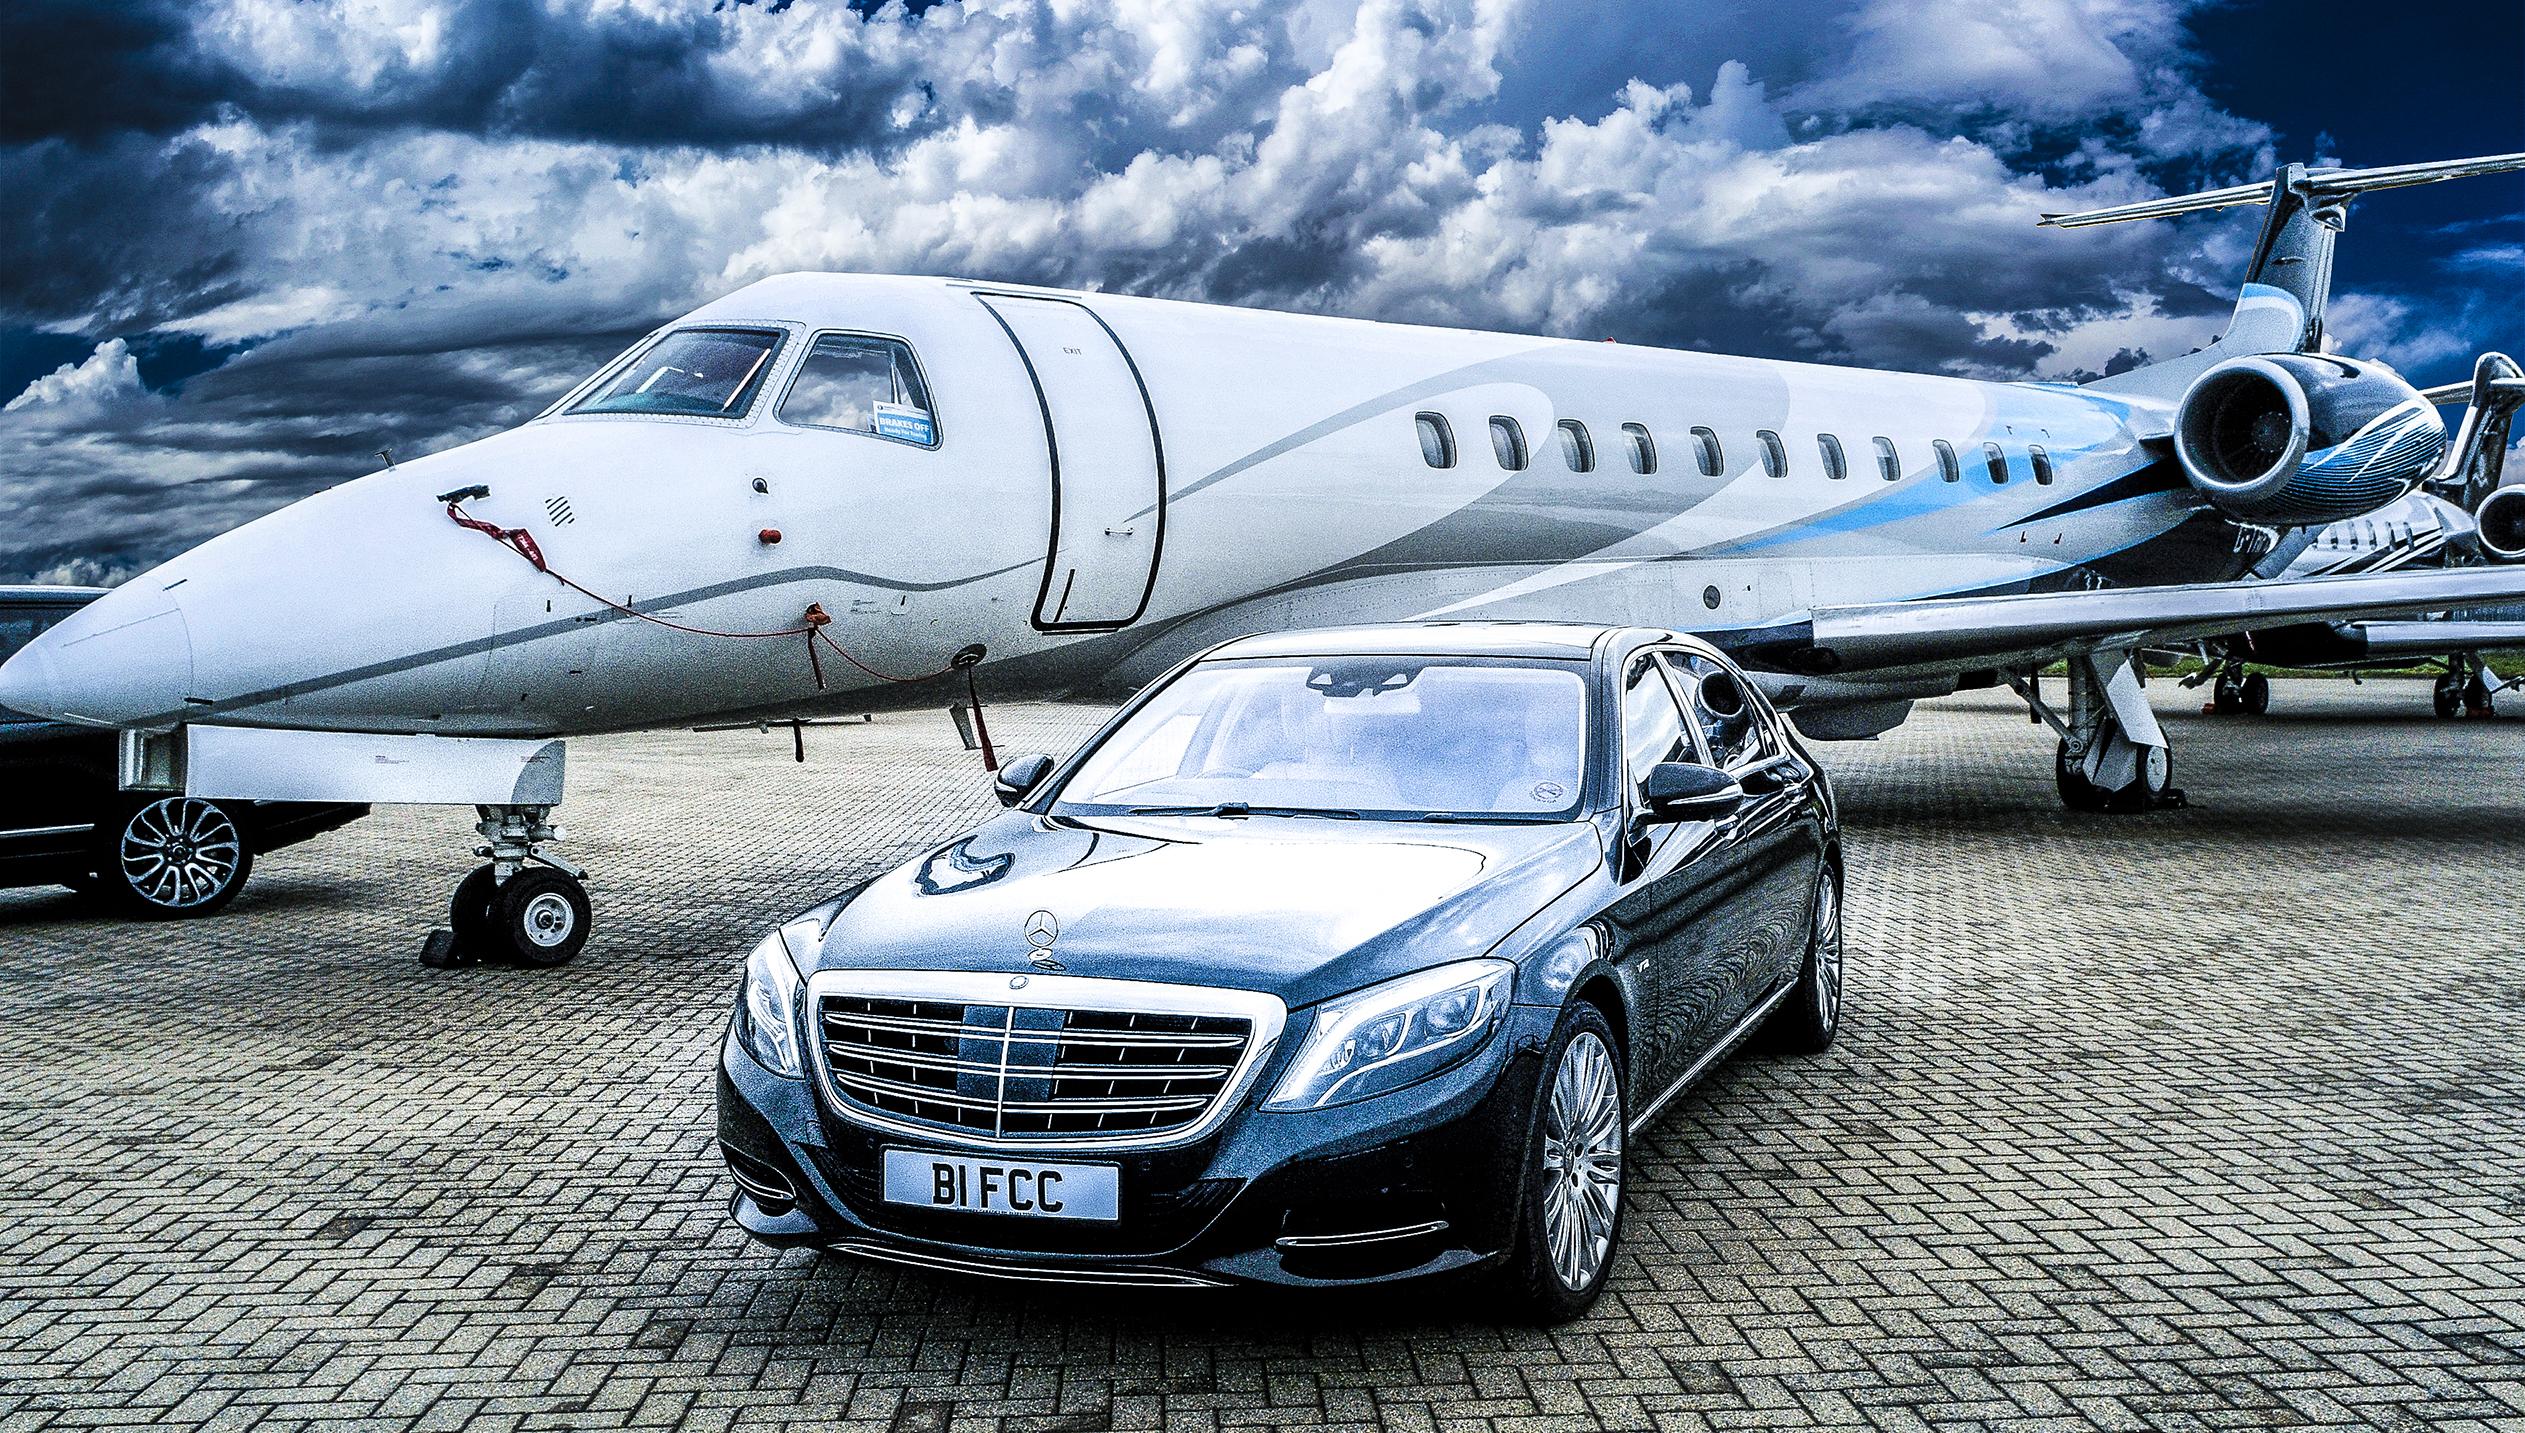 chauffeur car from Luton Airport